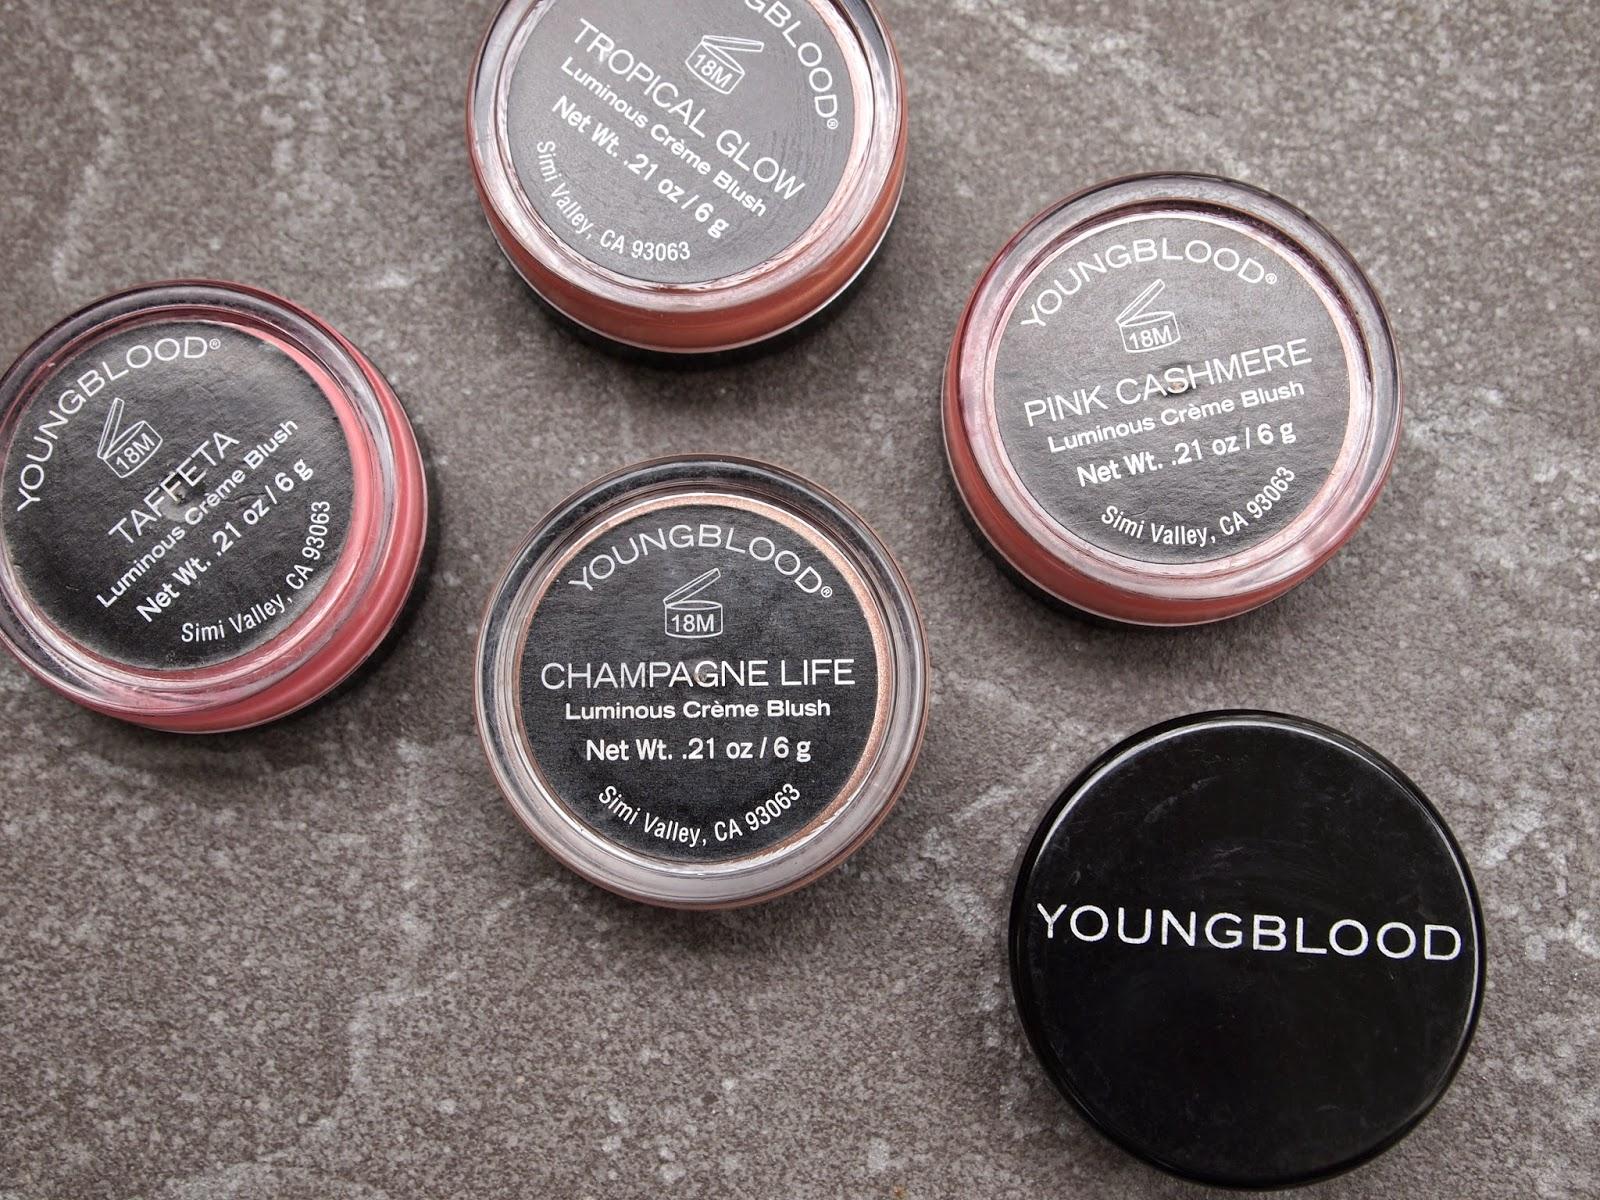 Youngblood Luminious Créme Blush x 5